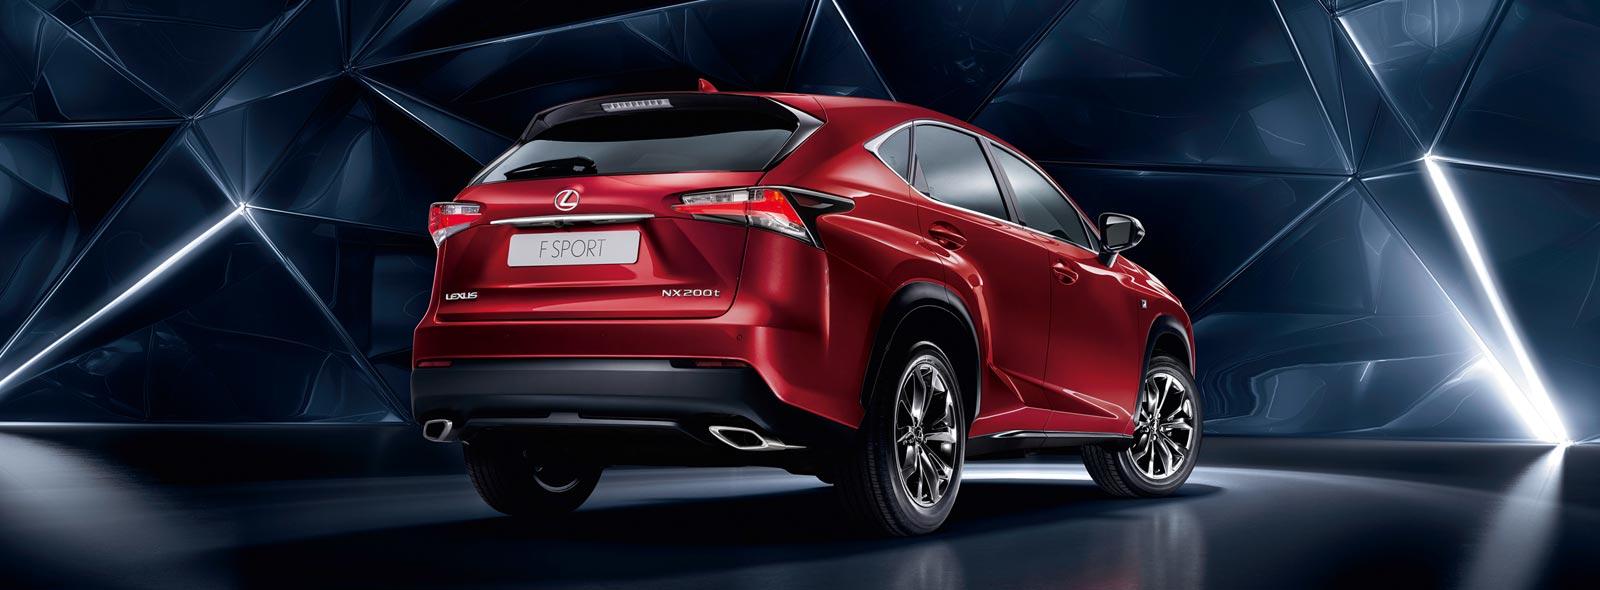 Вид сзади красного Lexus NX 200t